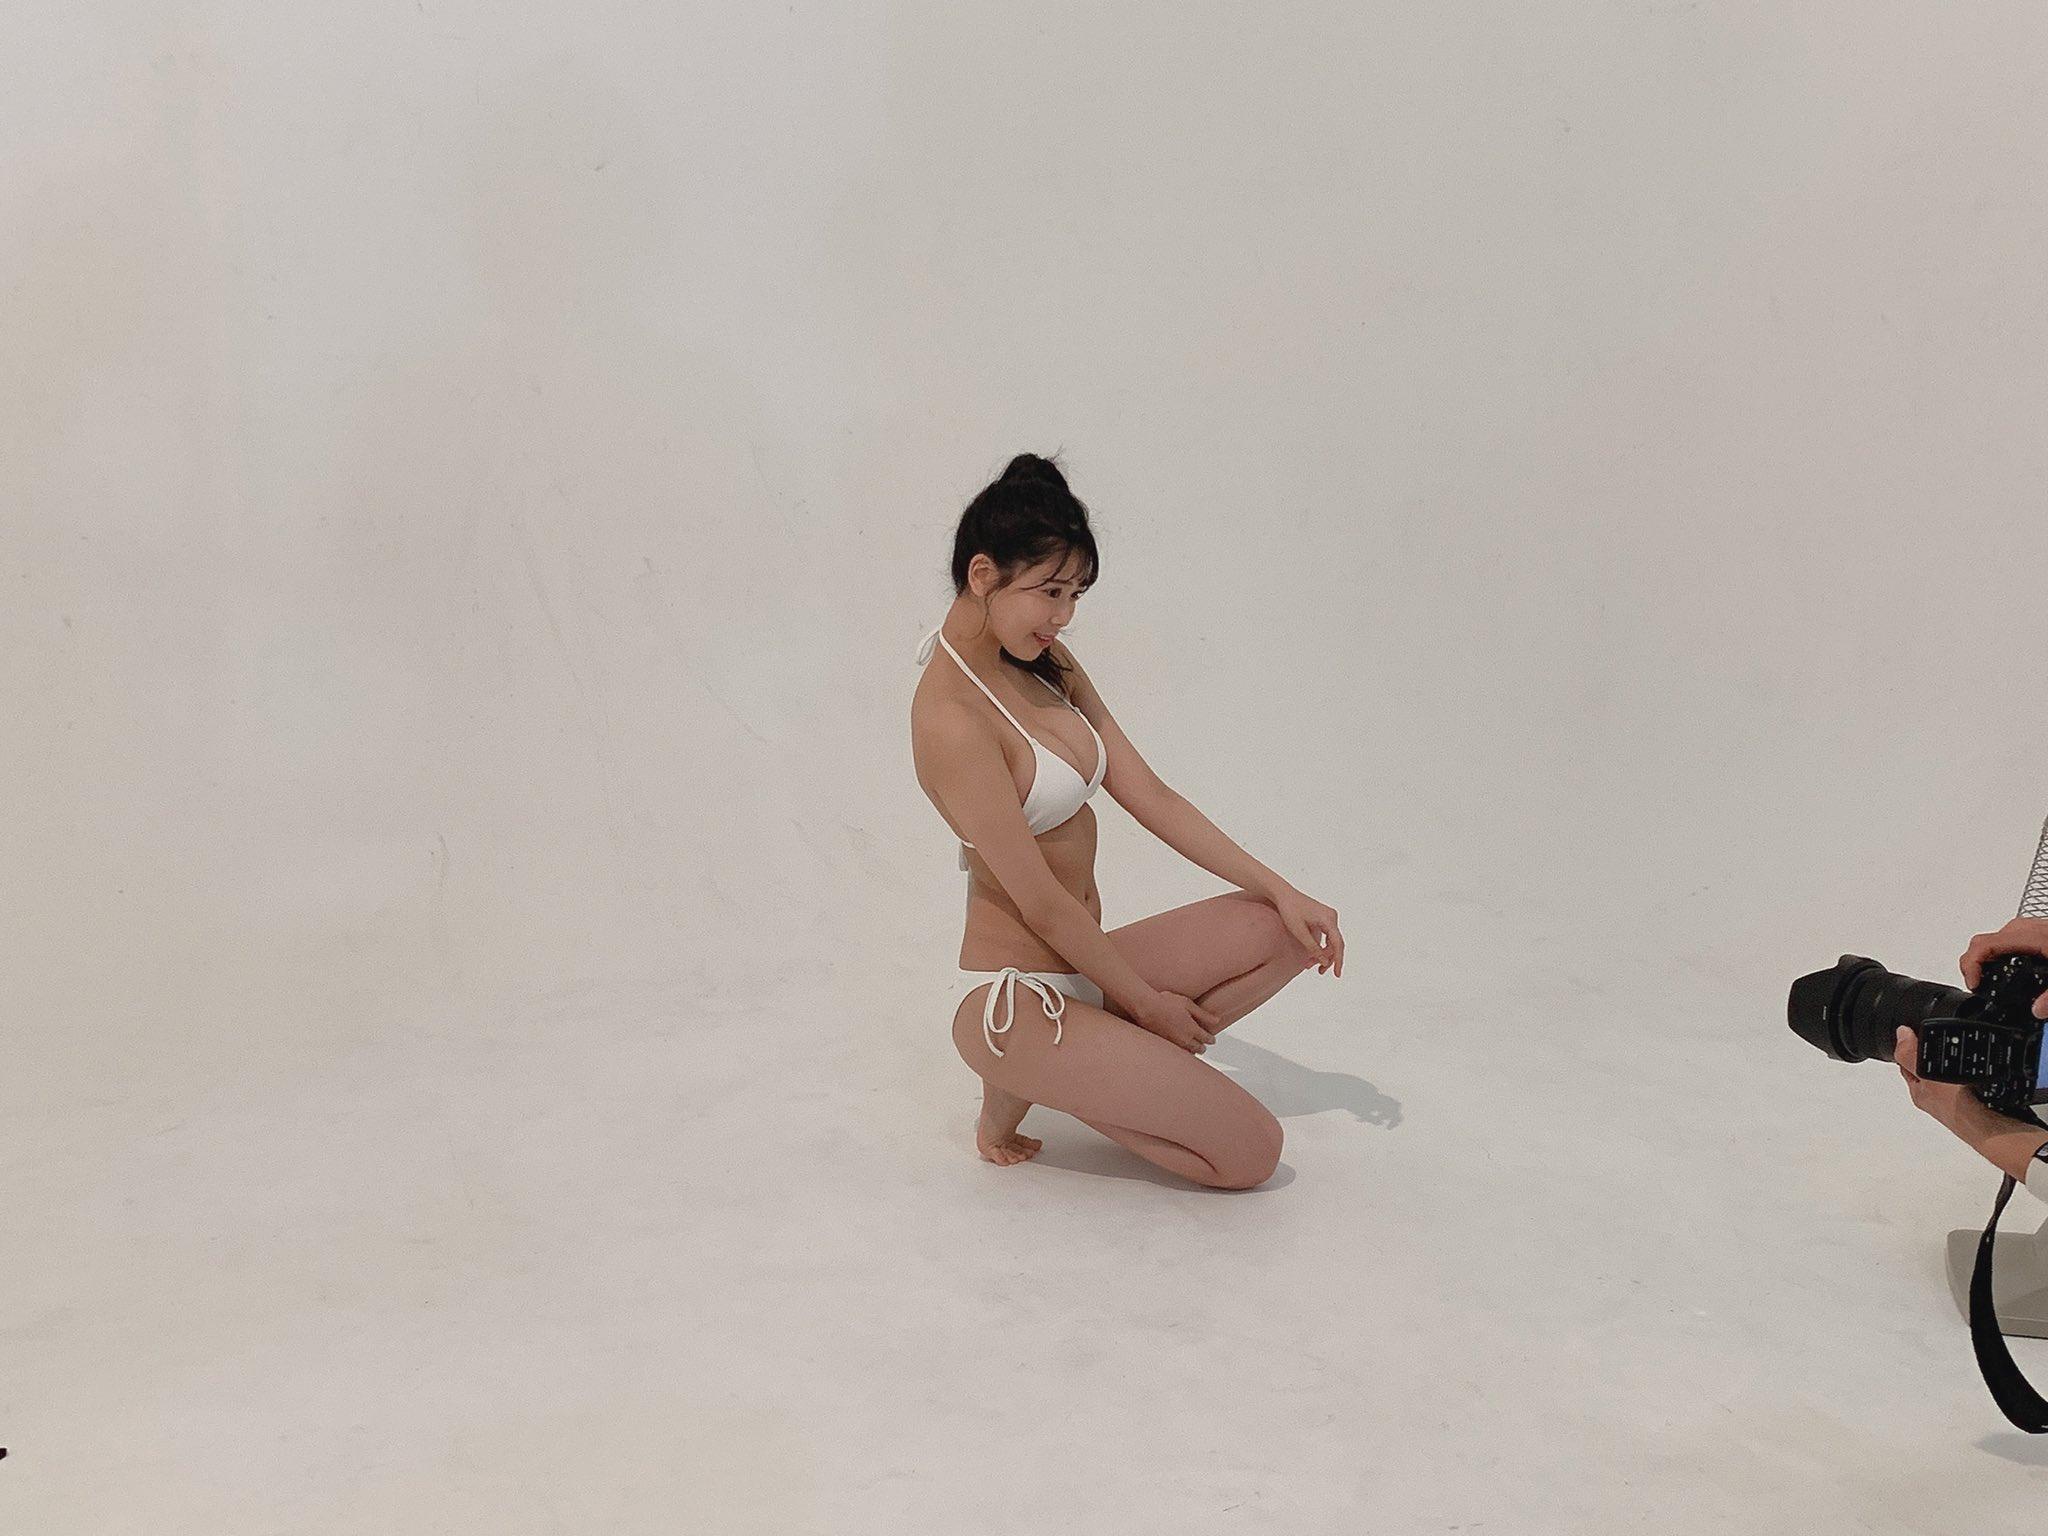 NMB48安田桃寧「美スタイルが映える白ビキニ…」水着グラビア撮影中のオフショットを公開【画像2枚】の画像001